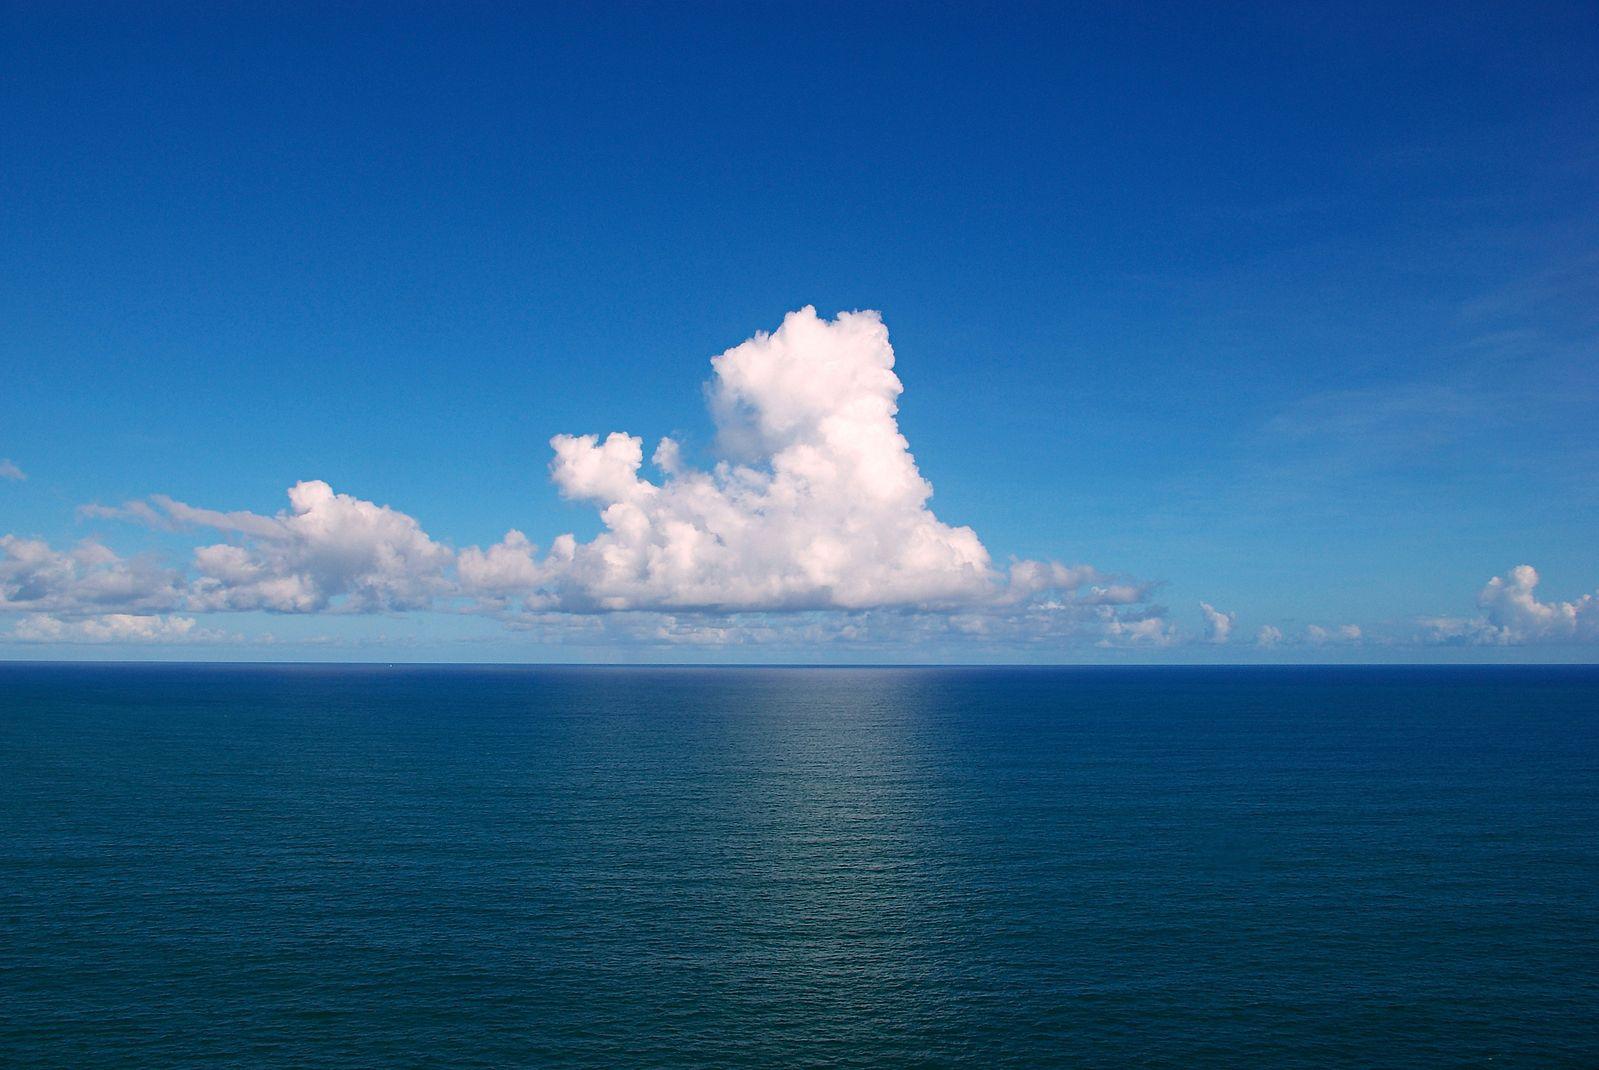 Clouds_over_the_Atlantic_Ocean